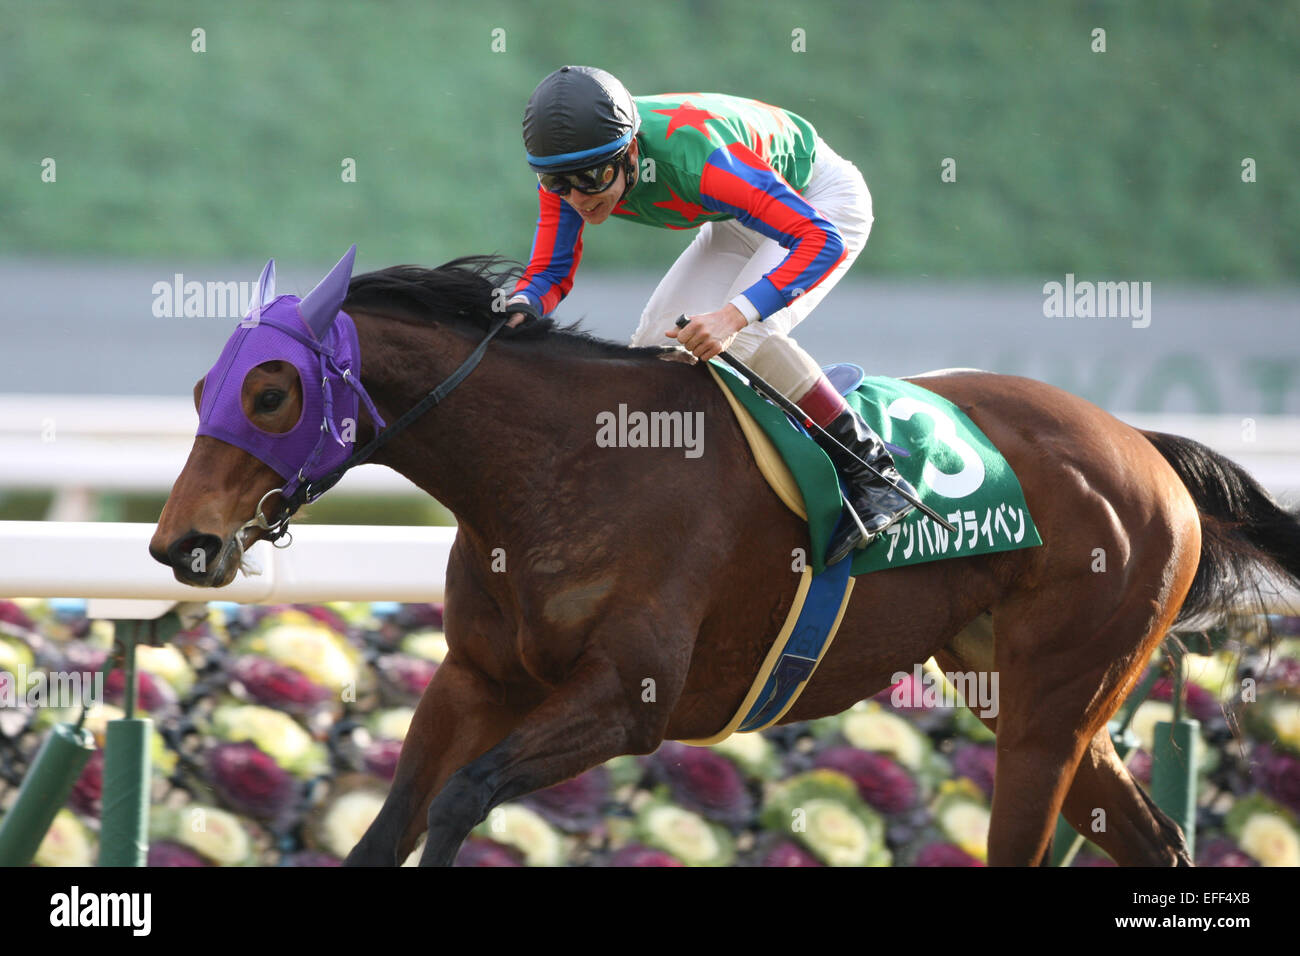 Kyoto, Japan. 1st Feb, 2015. Am Ball Bleiben (Ken Tanaka) Horse Racing : Am Ball Bleiben ridden by Ken Tanaka wins - Stock Image